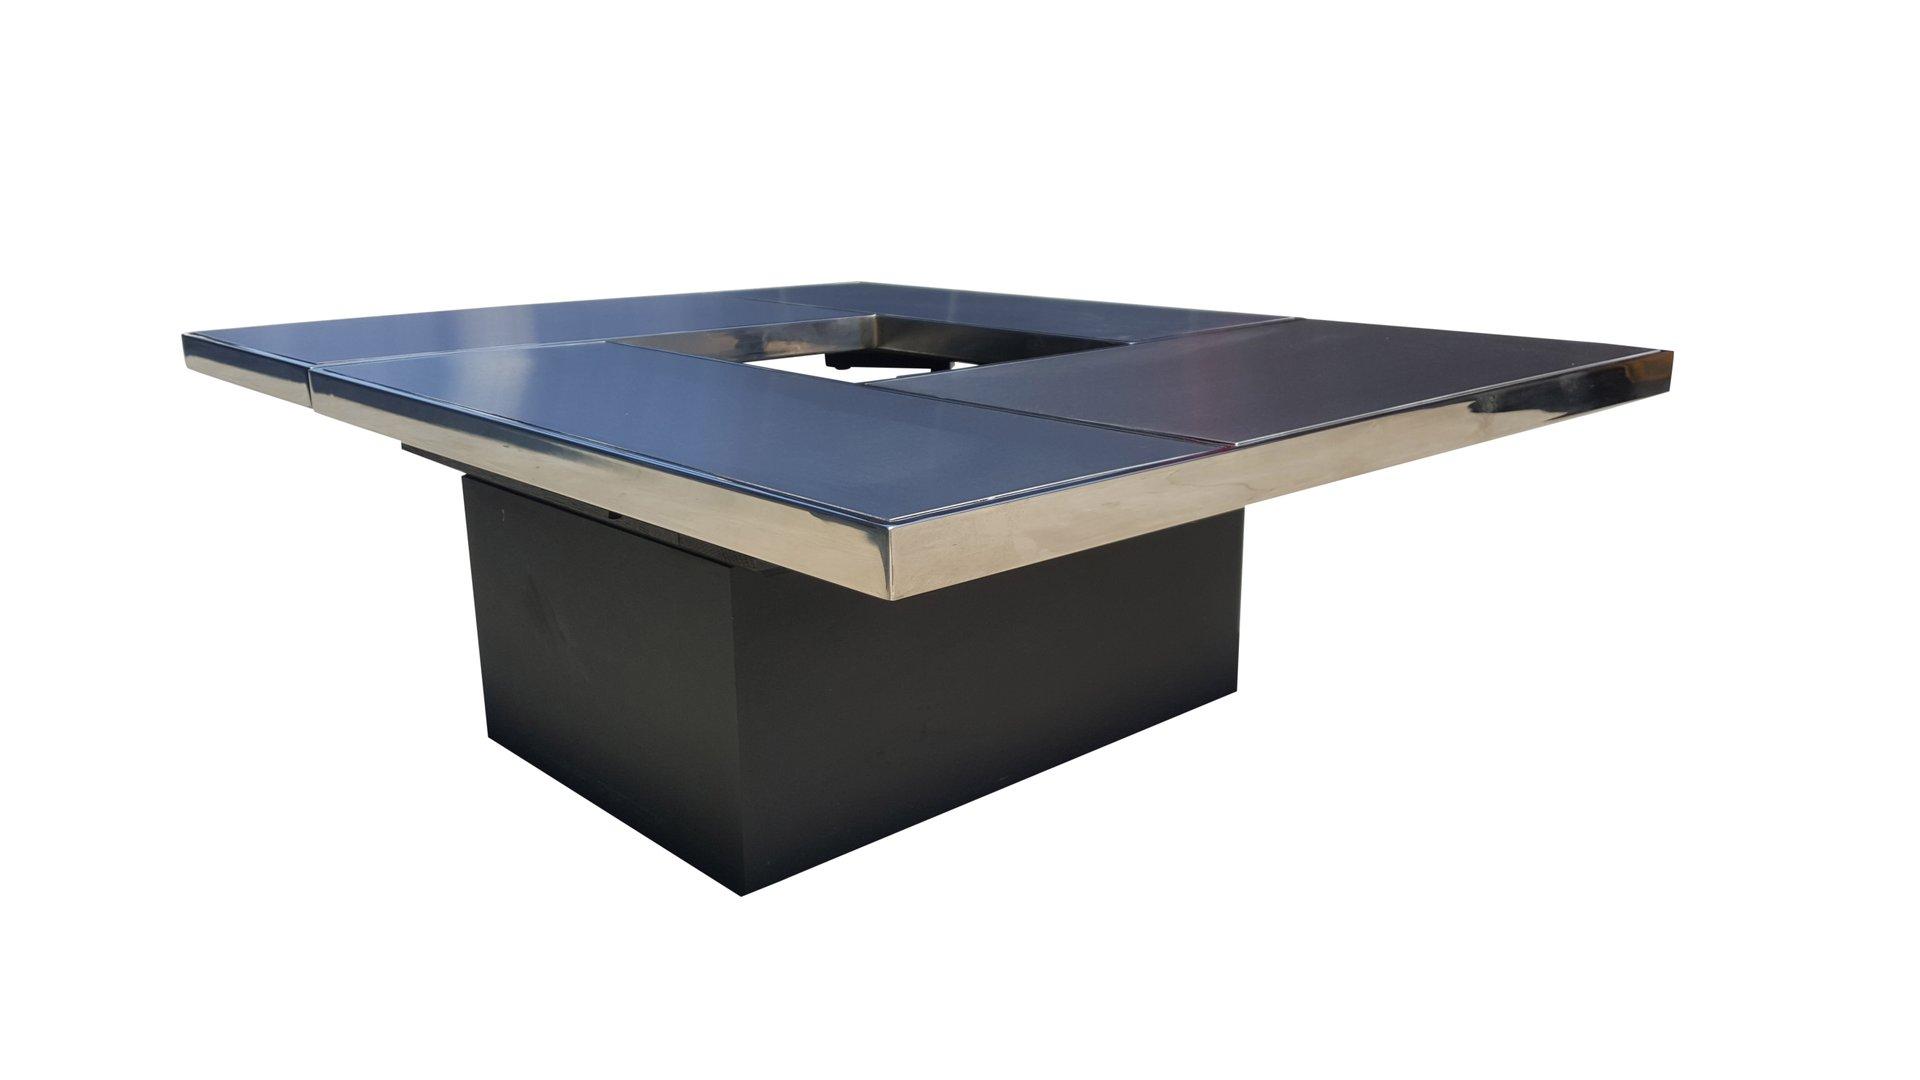 table basse coulissante avec bar cach de belgo chrom. Black Bedroom Furniture Sets. Home Design Ideas